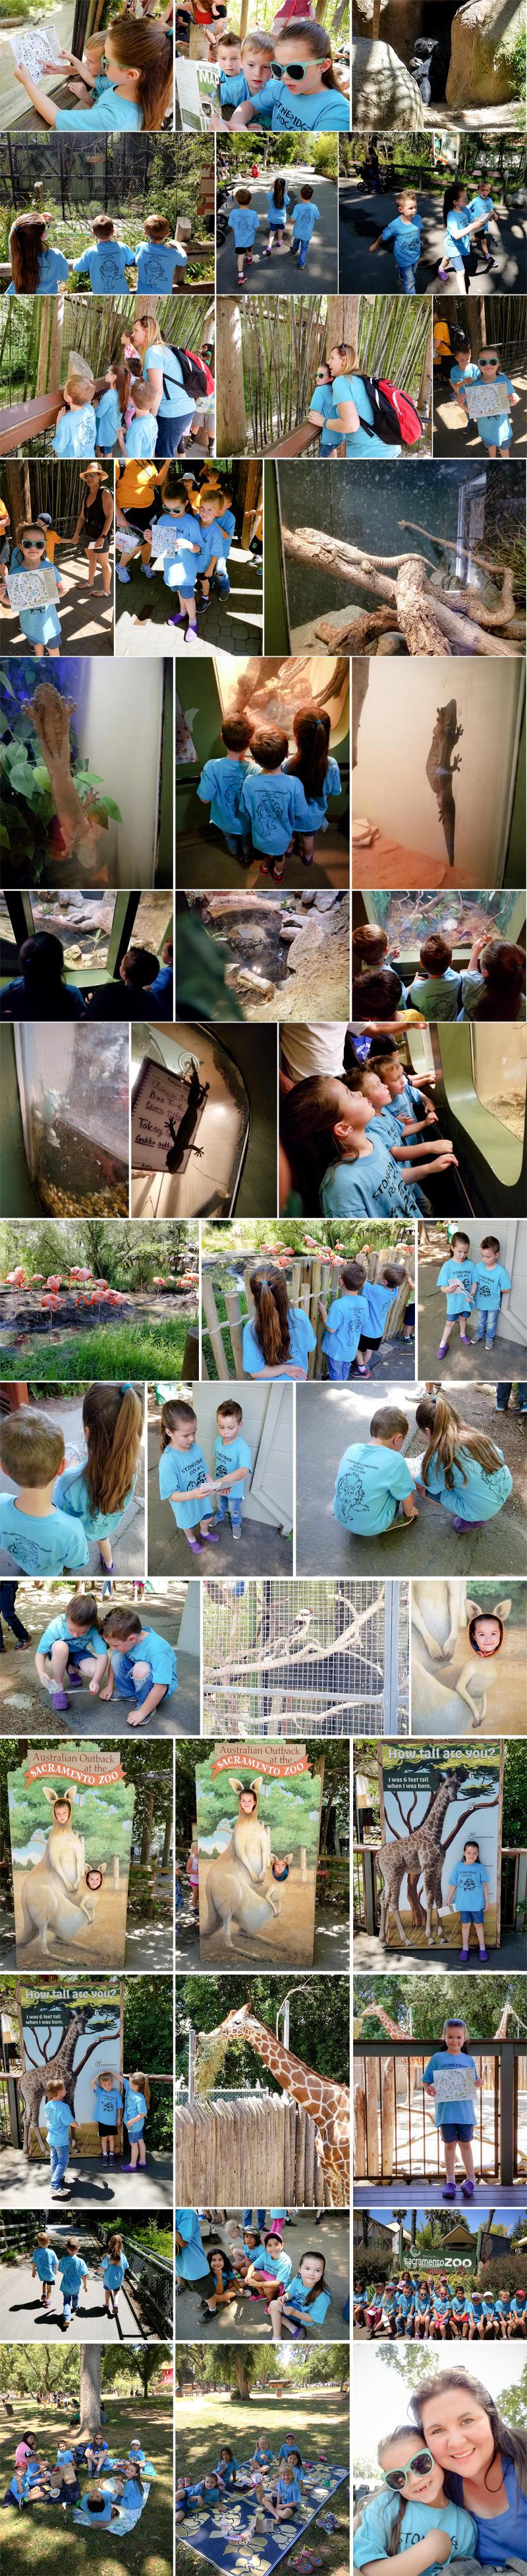 Sacramento Zoo Field Trip